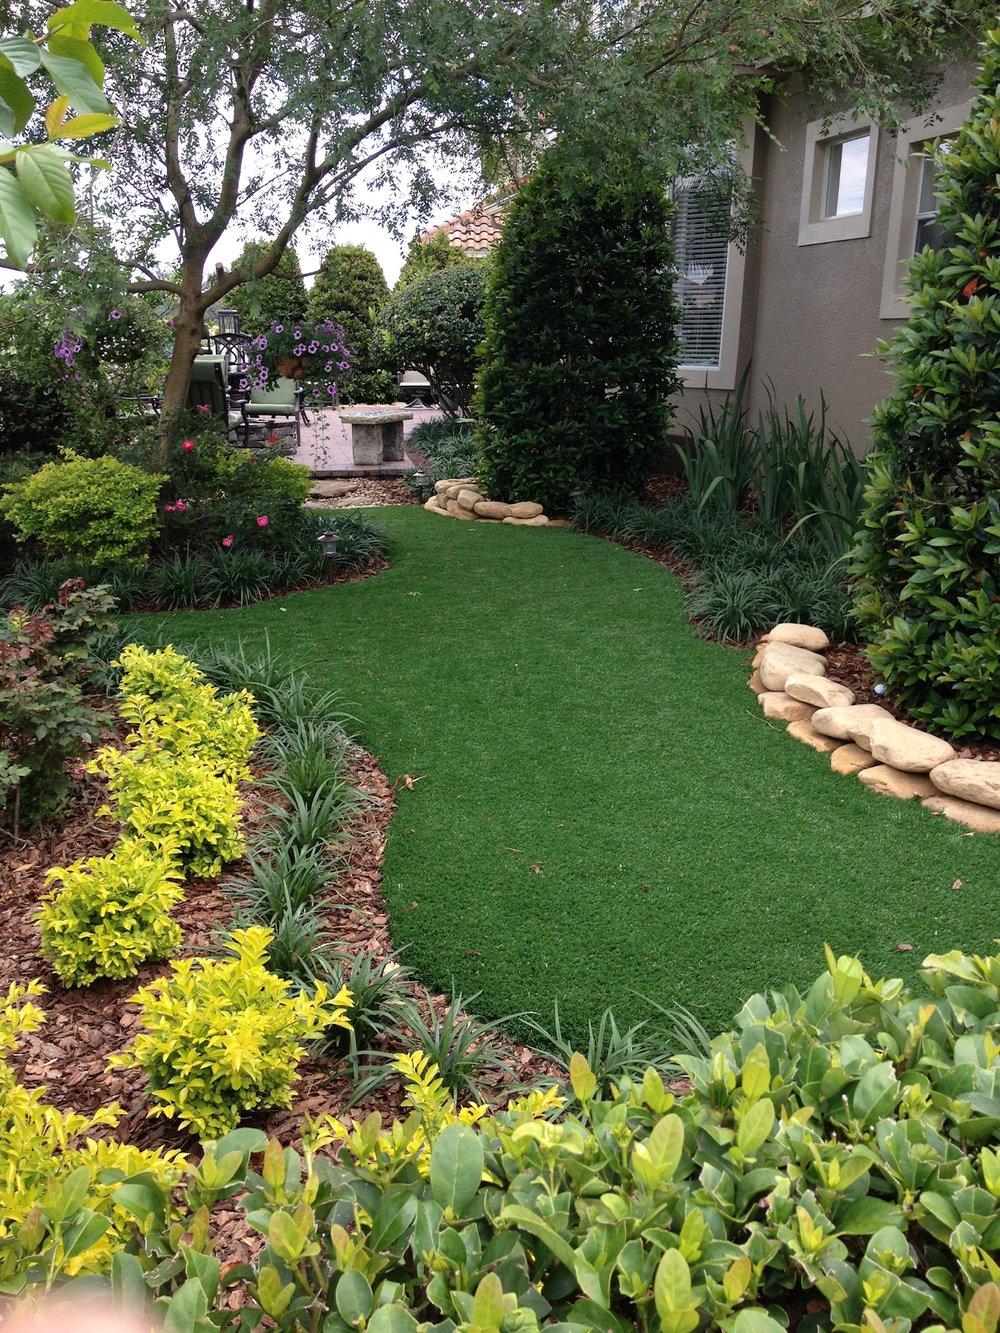 Heritage Green - Providence/Davenport